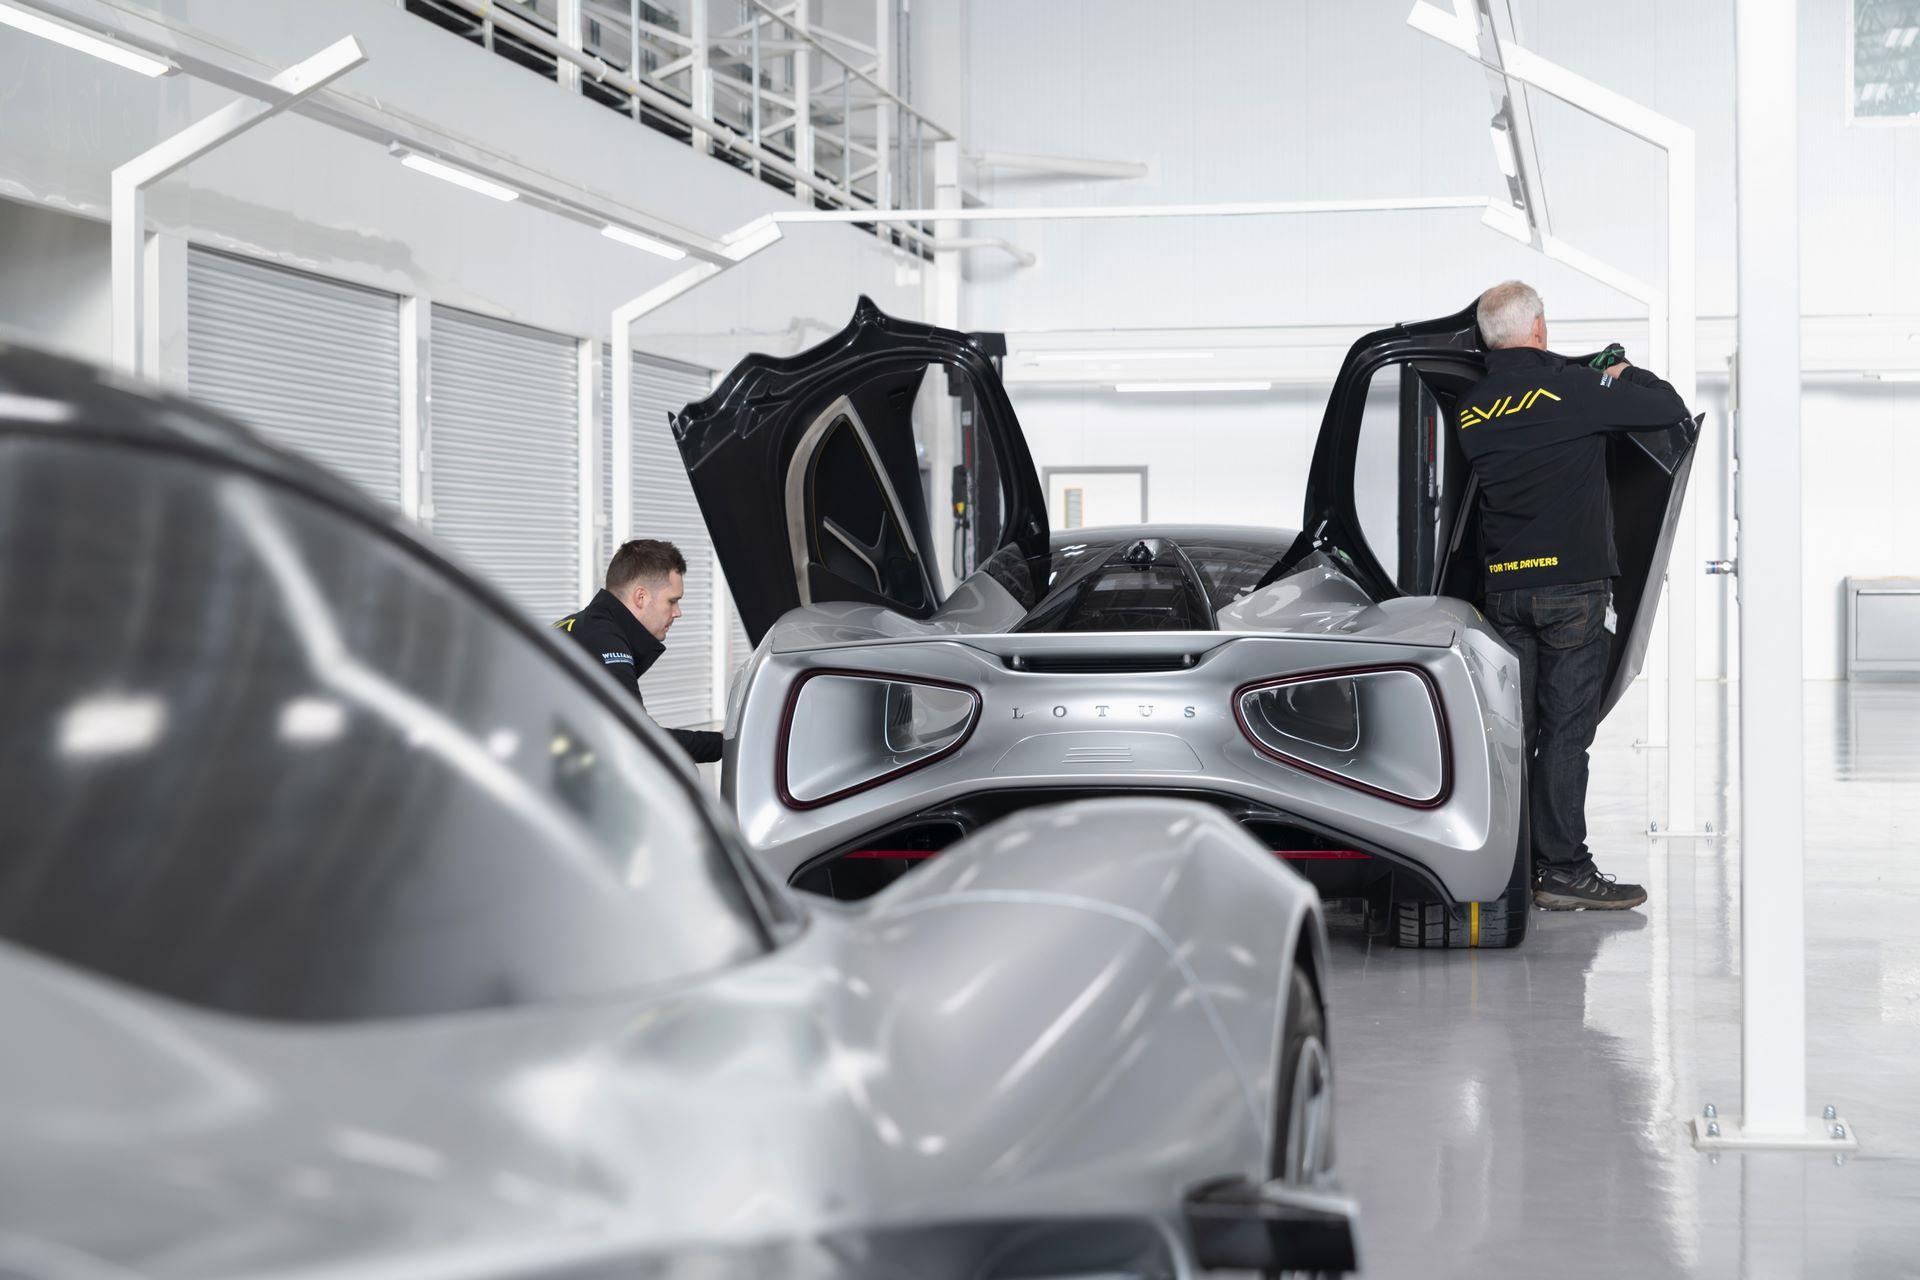 Lotus-Evija-Assembly-Hall_plant-factory-1